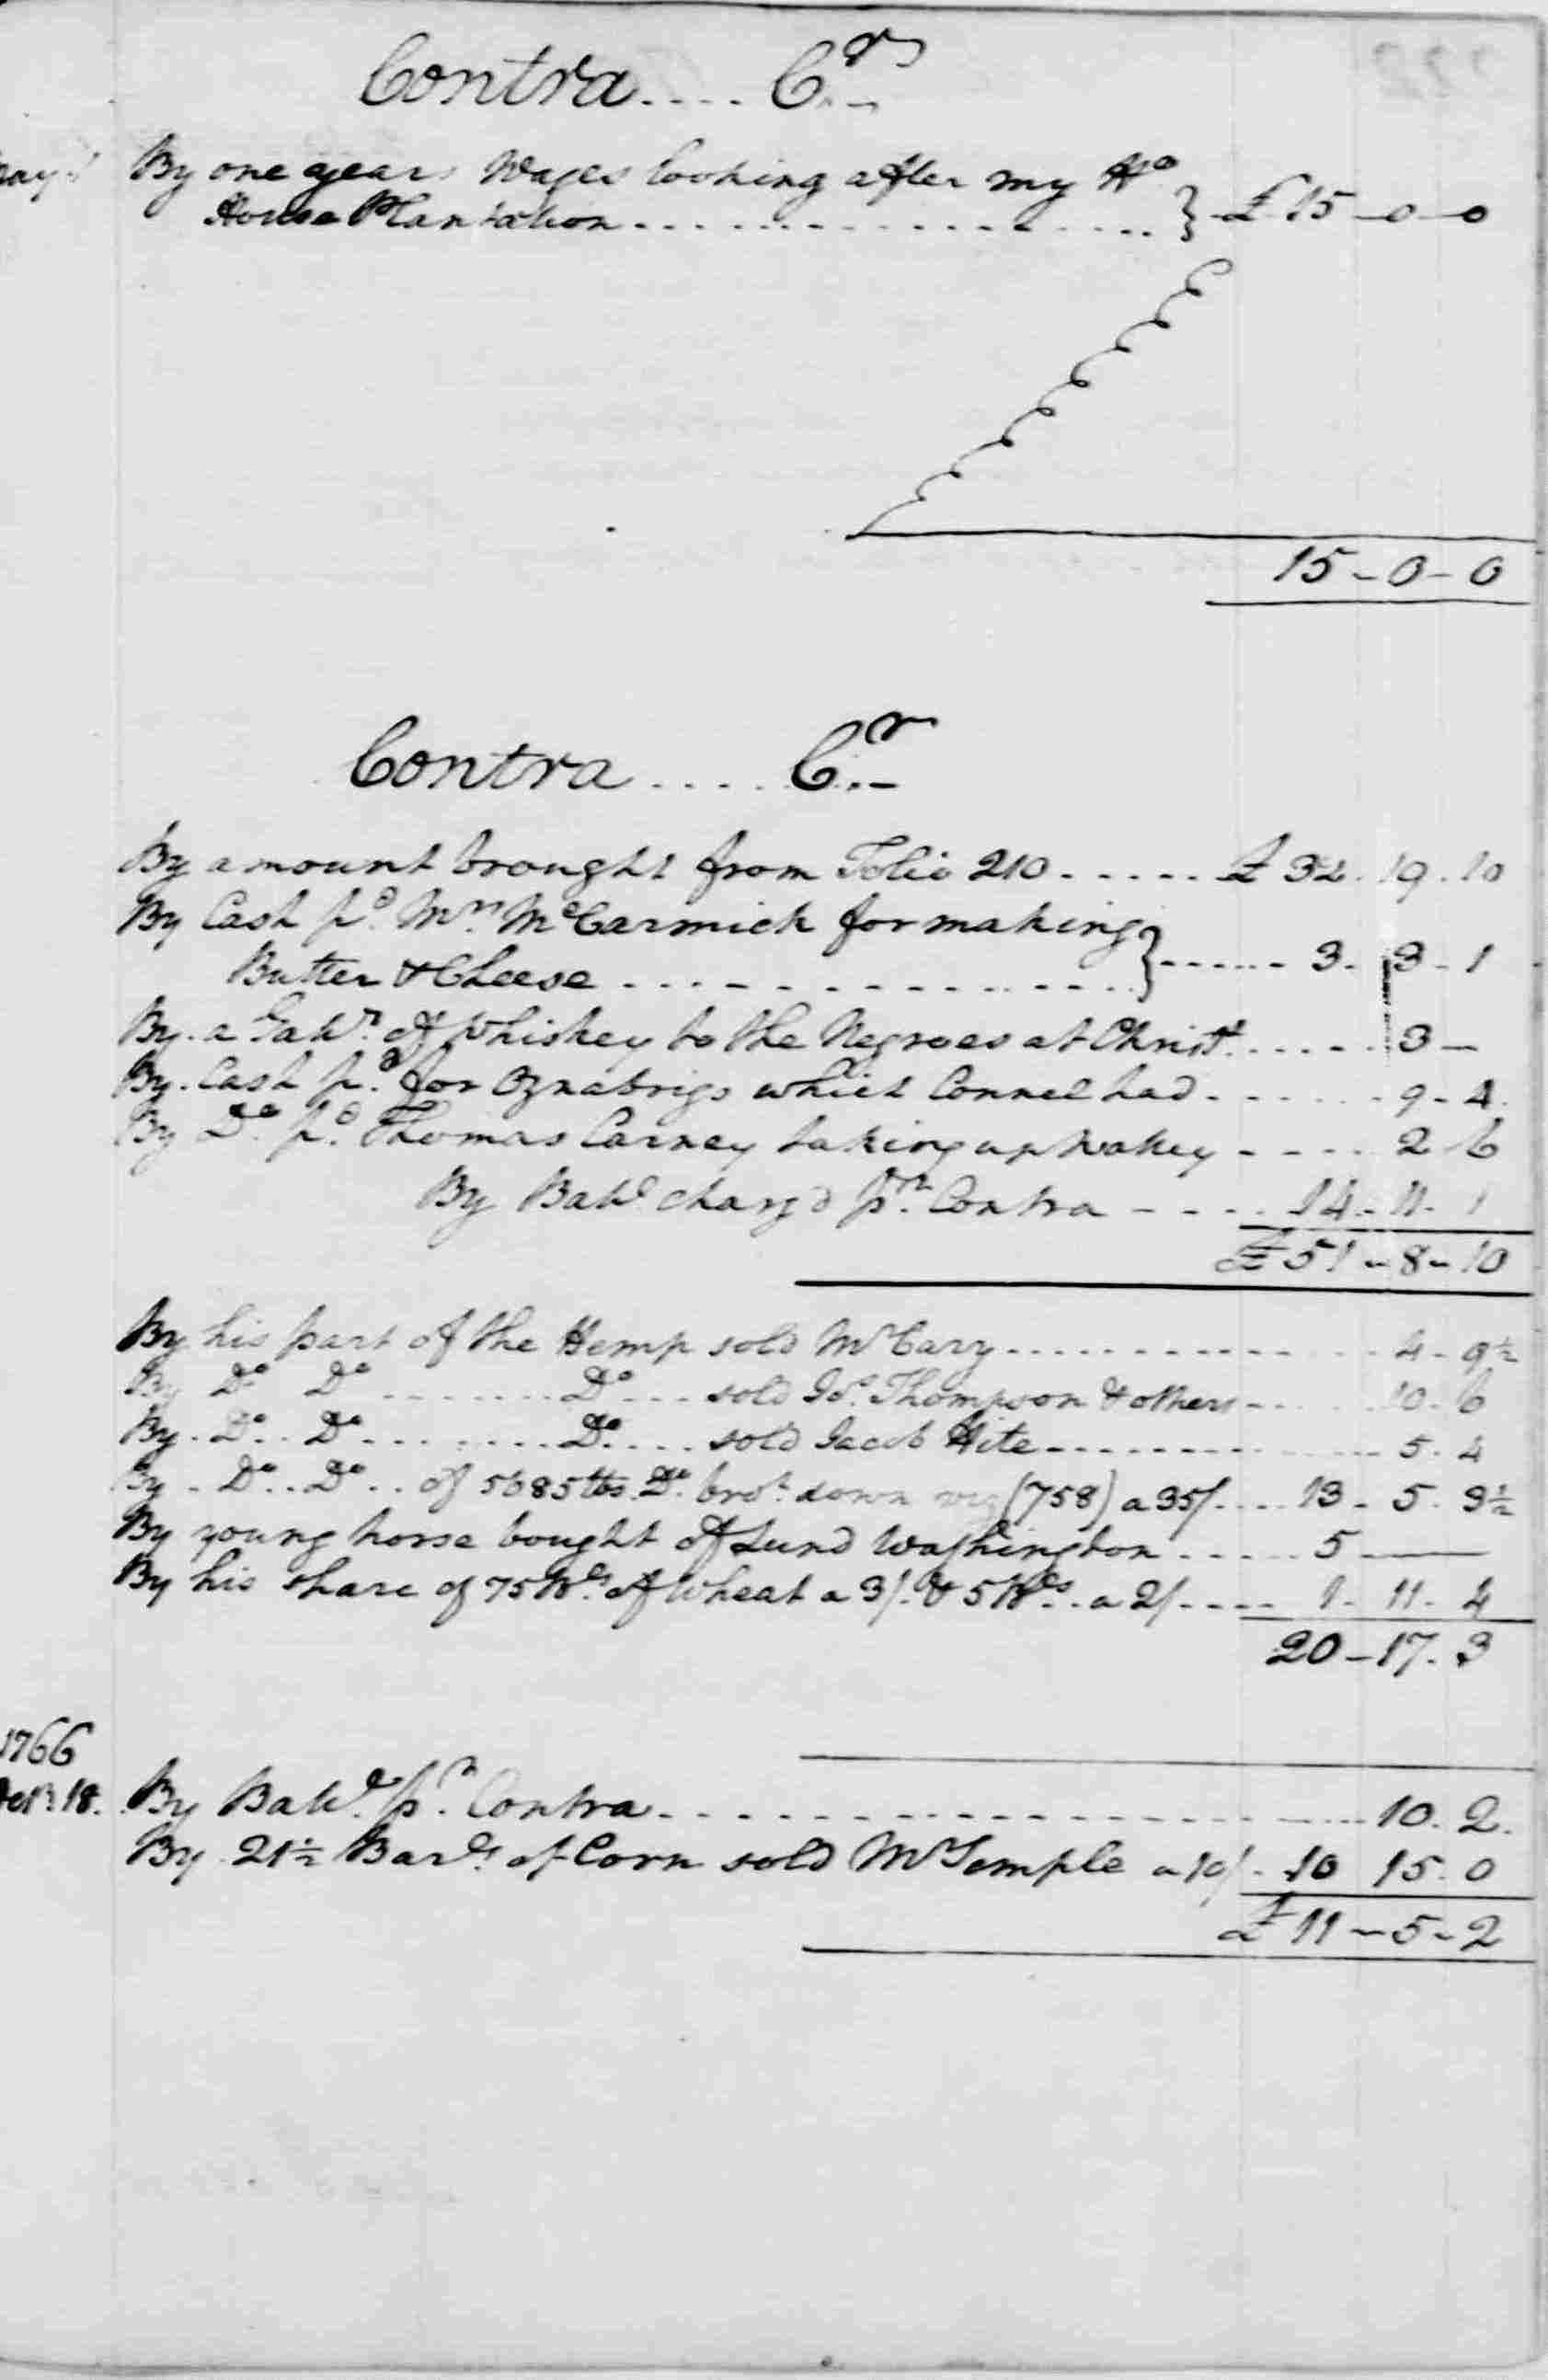 Ledger A, folio 221, right side